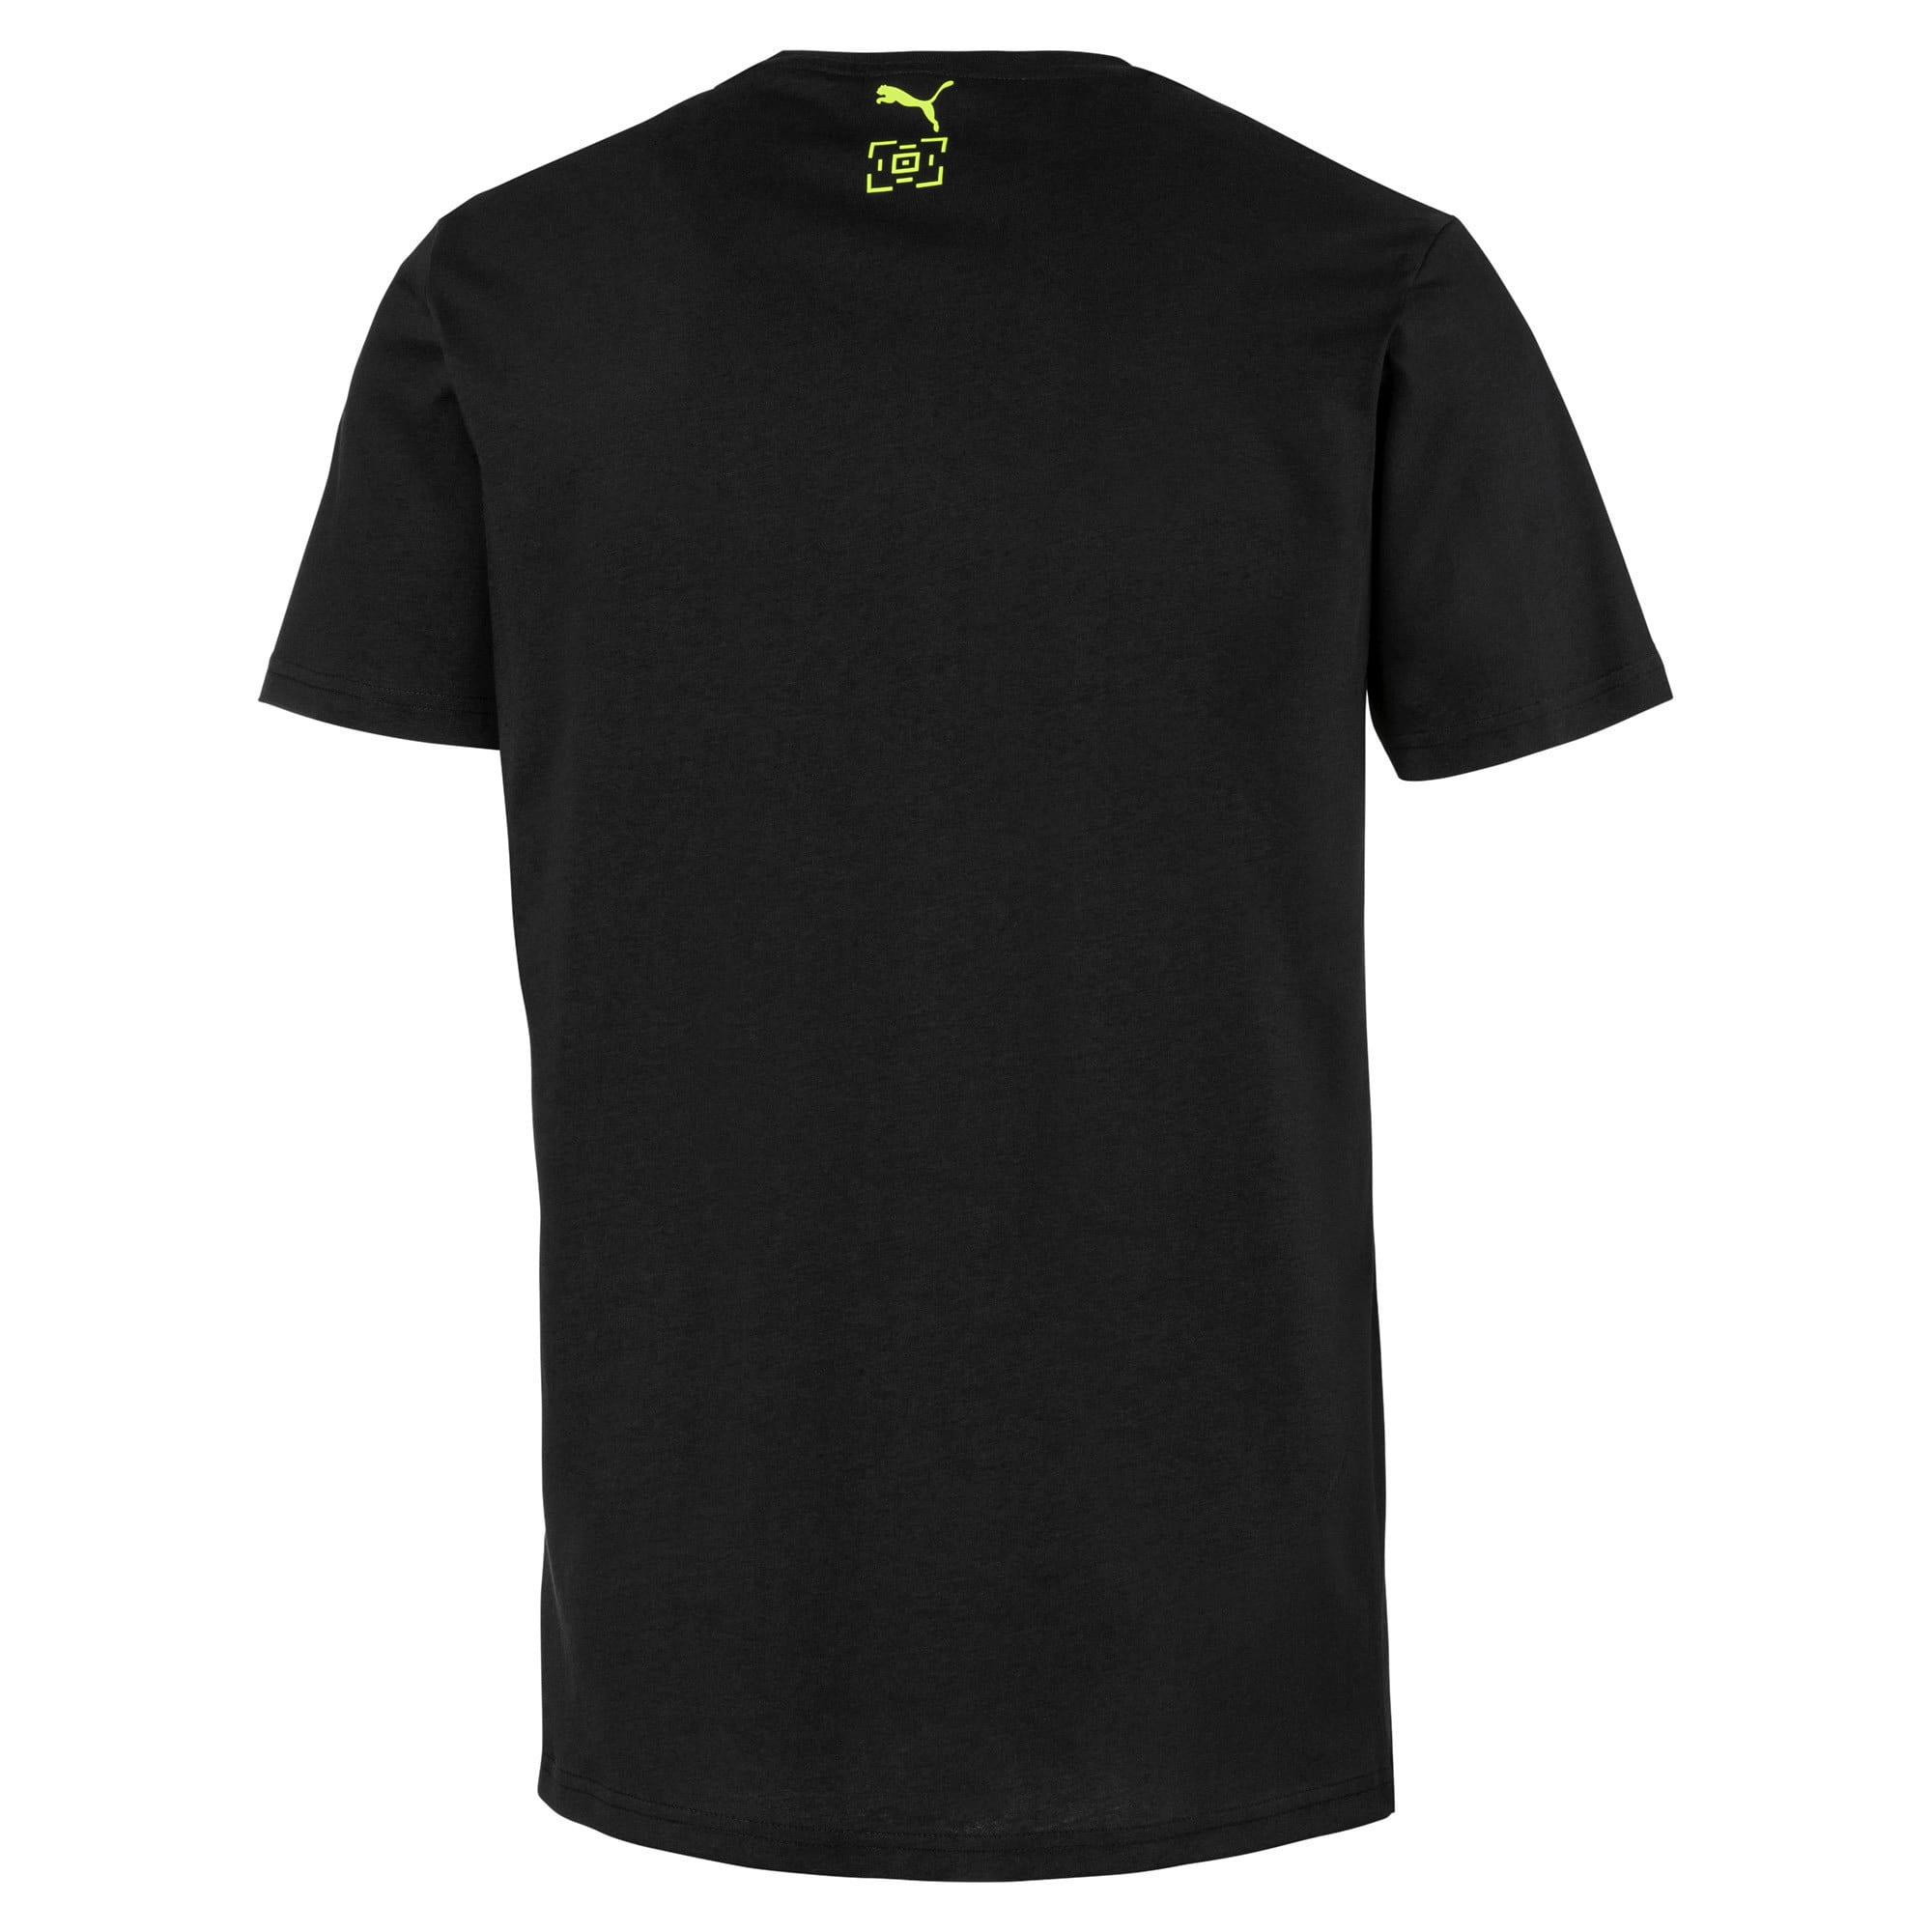 Thumbnail 5 of PUMA x LES BENJAMINS Tシャツ, Puma Black, medium-JPN